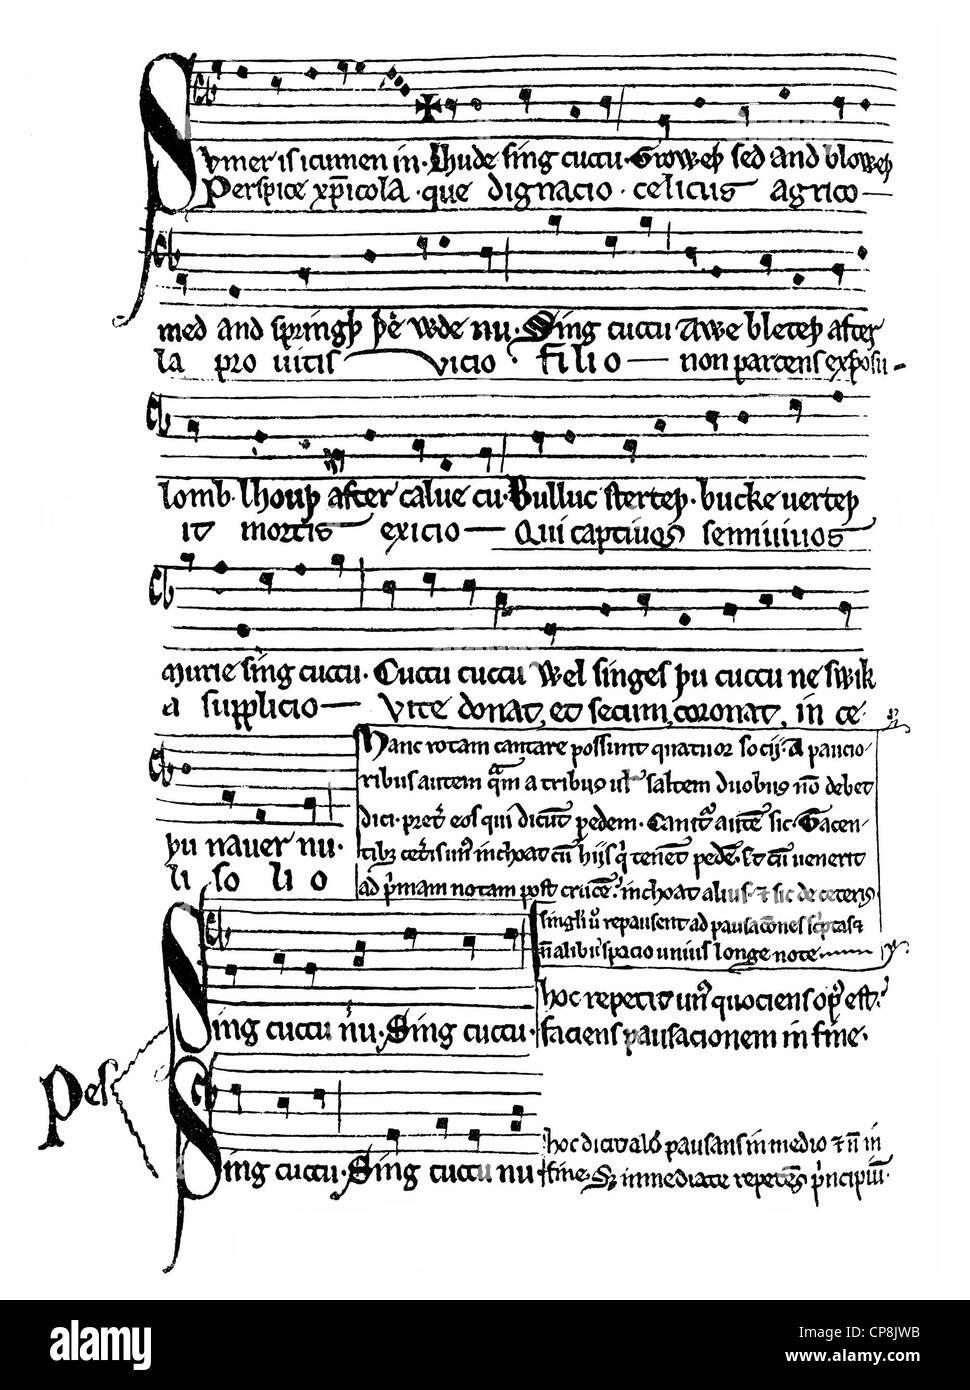 manuscript from the 13th Century, Middle English song, Ein mittelengisches Lied aus dem 13. Jahrhundert - Stock Image